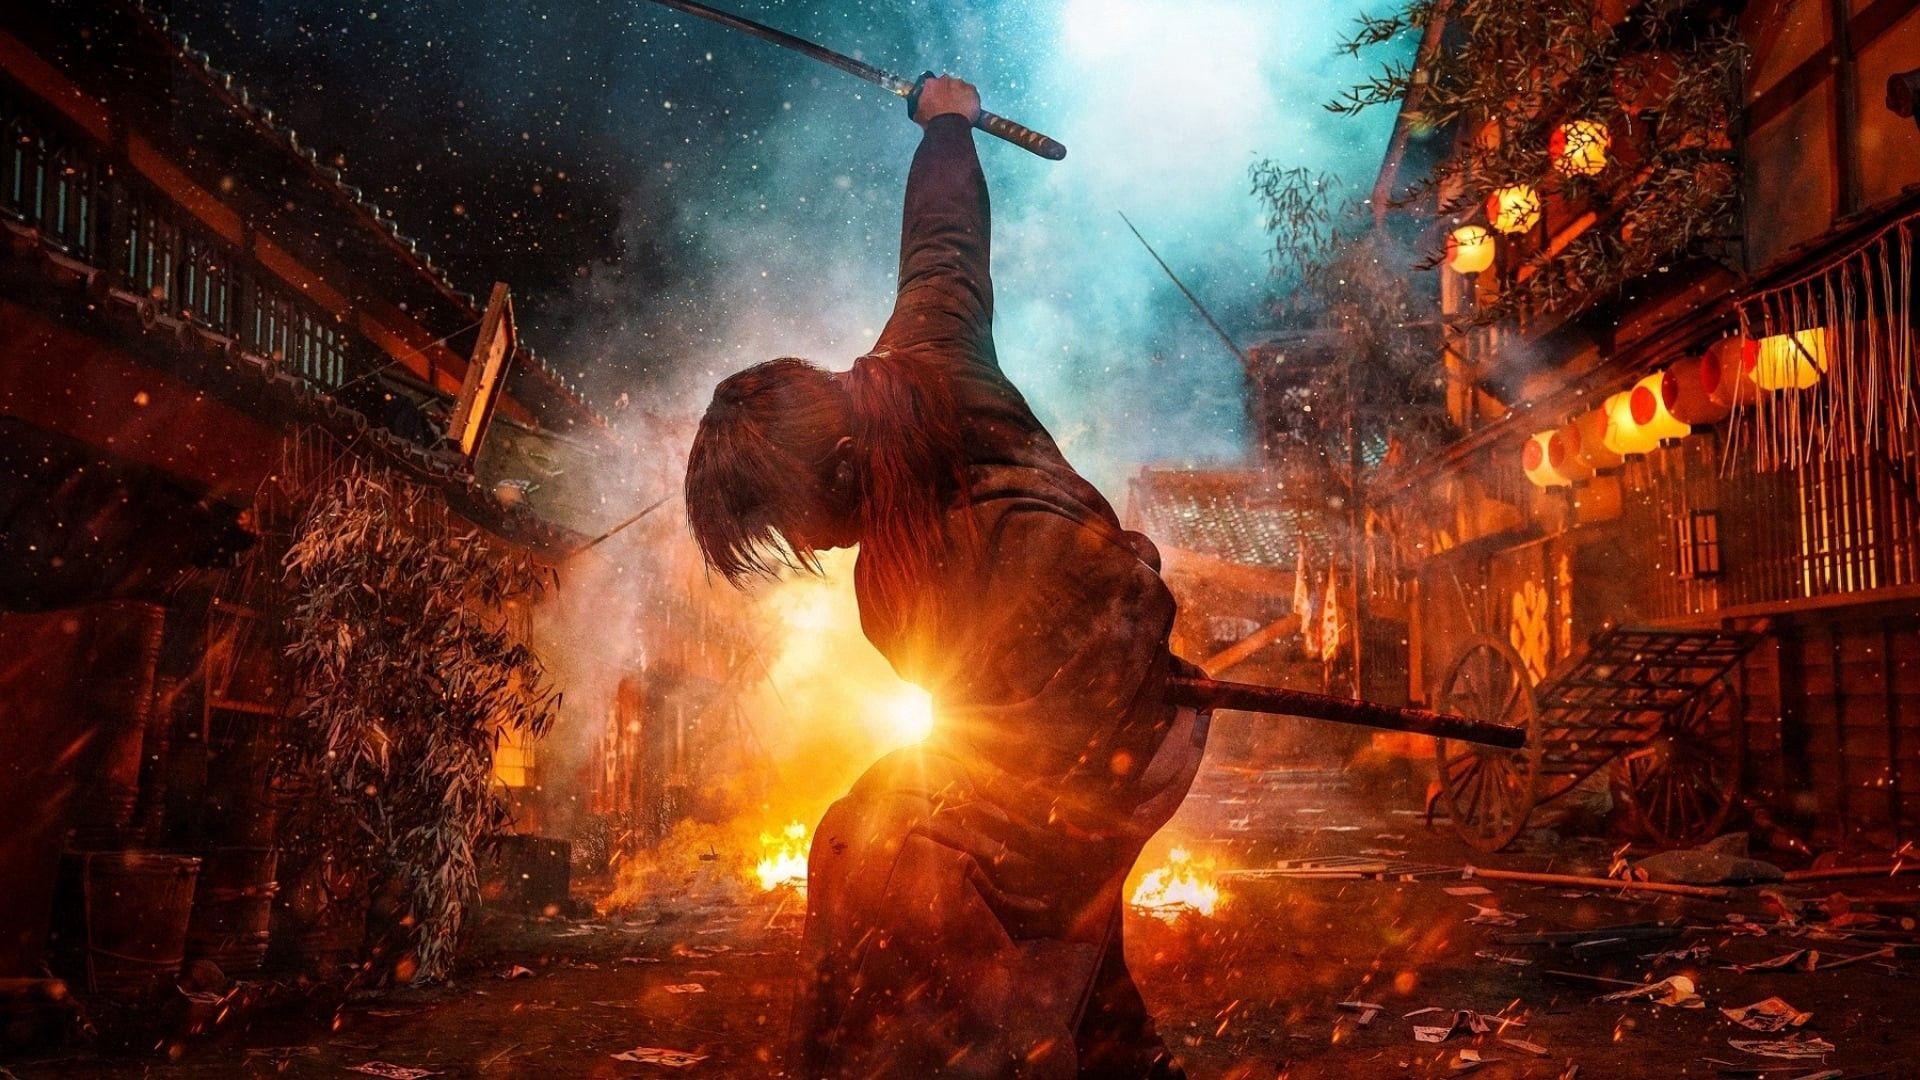 Rurouni Kenshin: The Final: Release Date, What To Expect? - OtakuKart